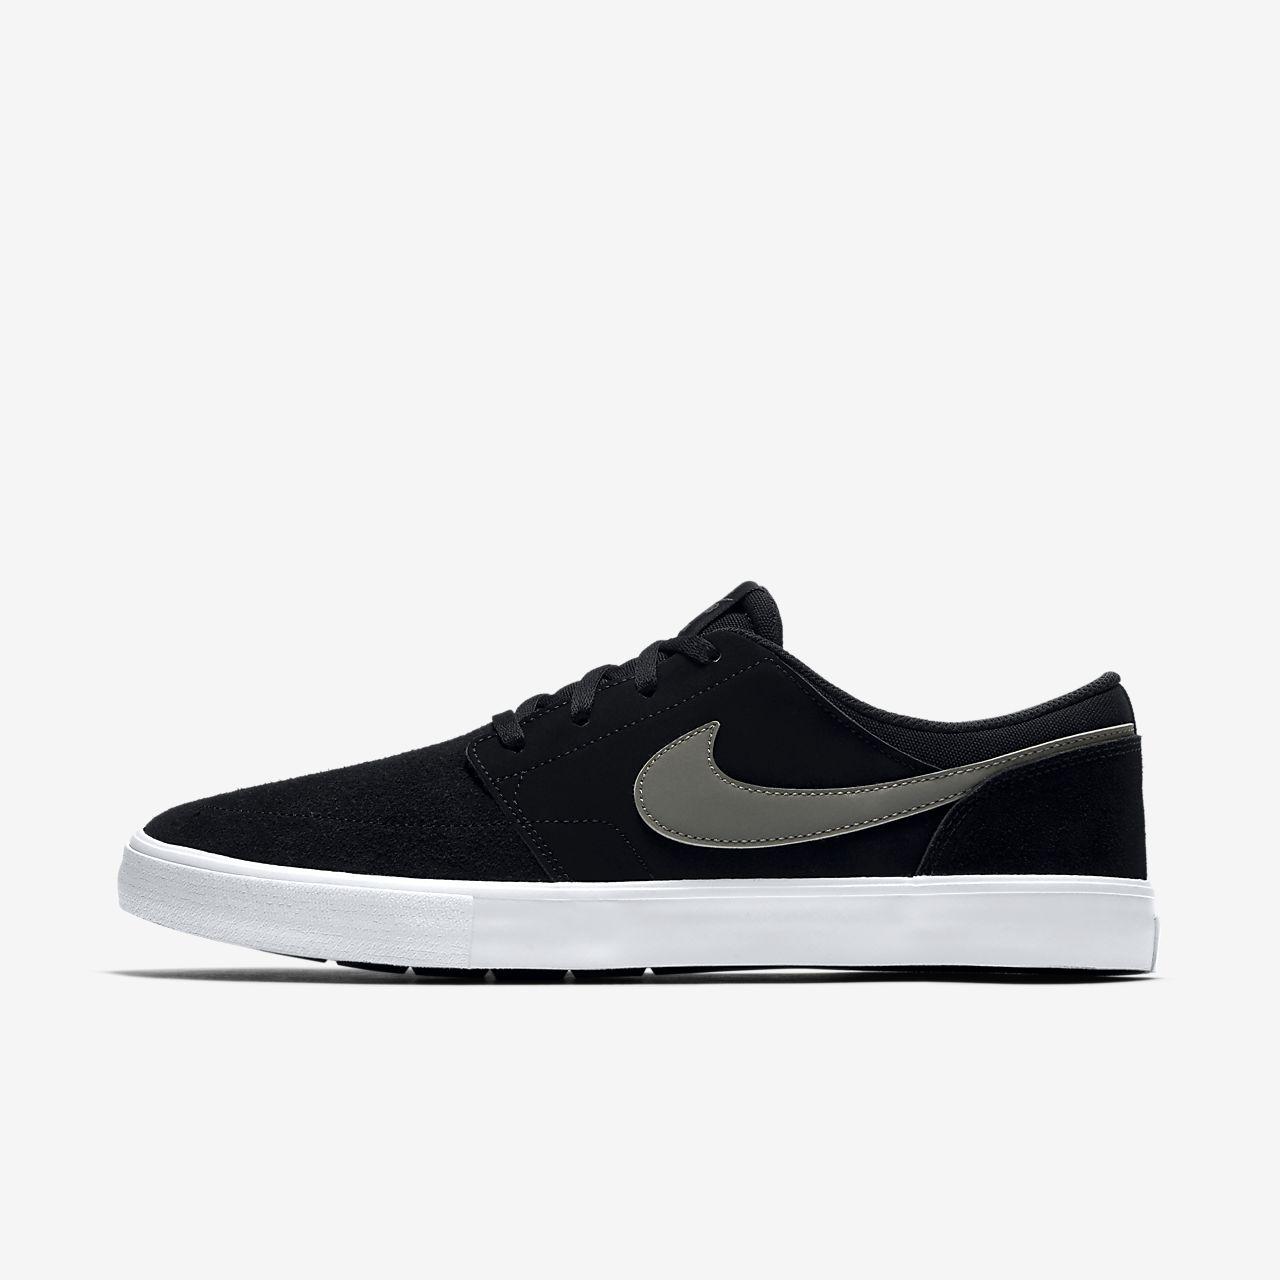 ... Chaussure de skateboard Nike SB Solarsoft Portmore II pour Homme